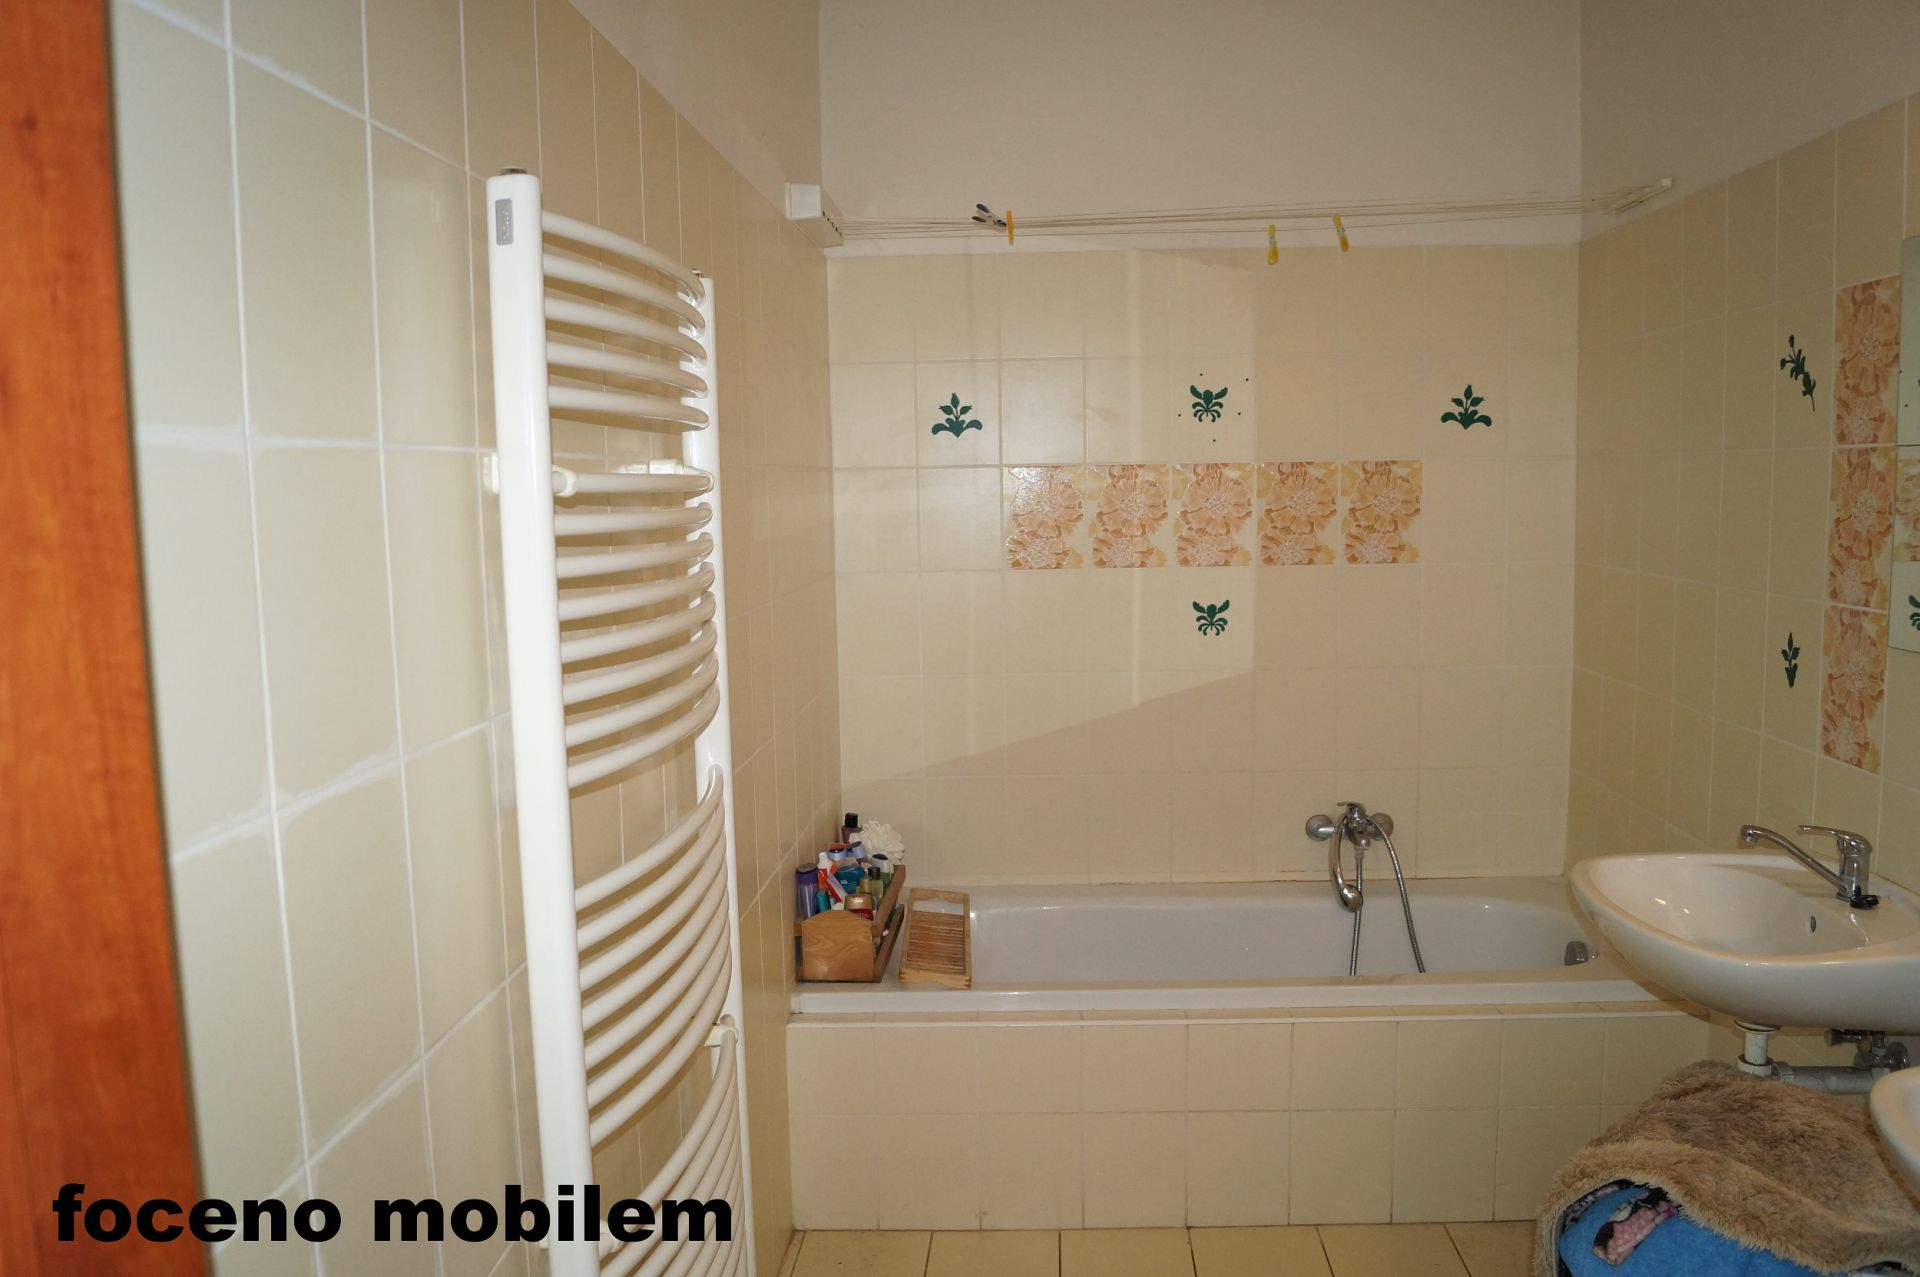 fotka_mobilem